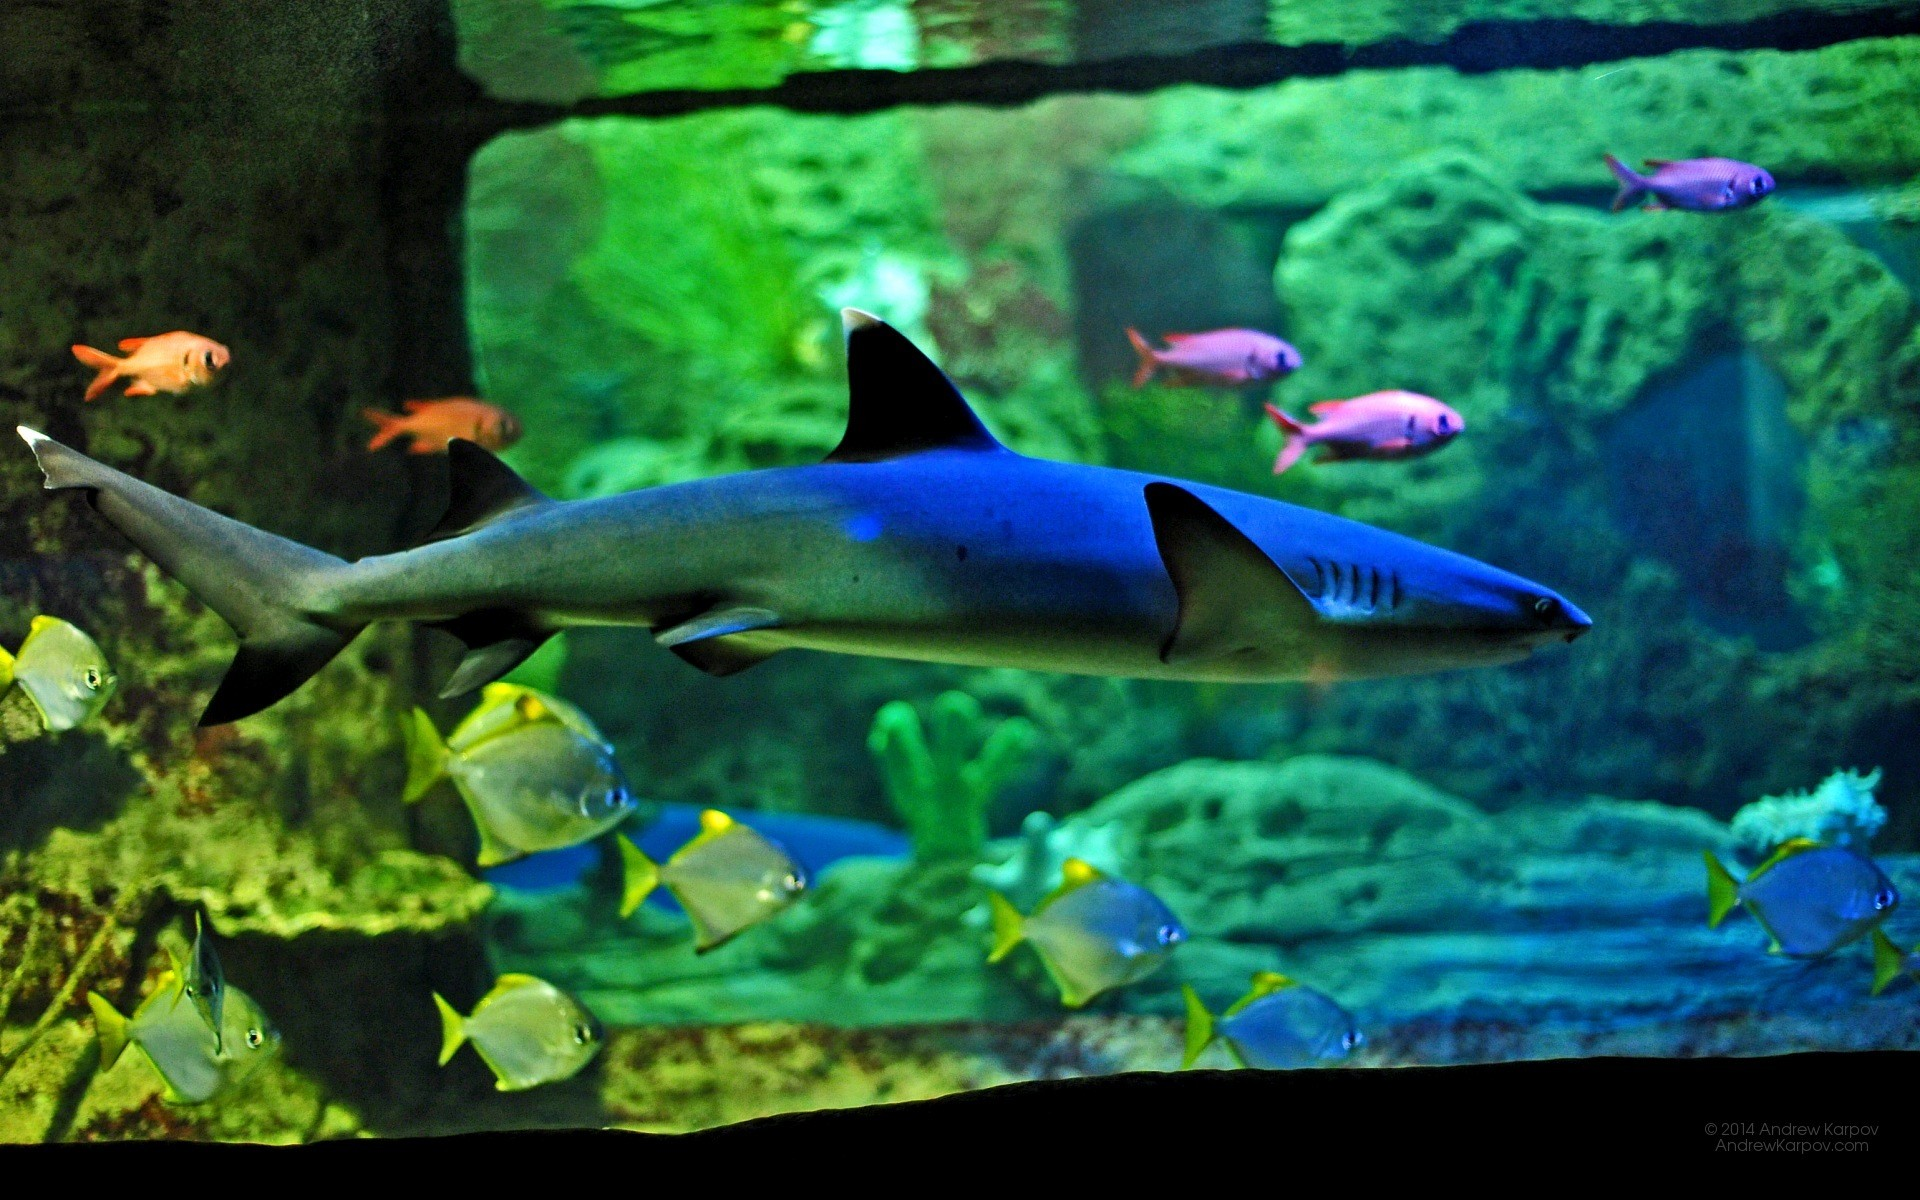 Iphone X Live Wallpaper Gif Download Die 54 Besten Aquarium Hintergrundbilder